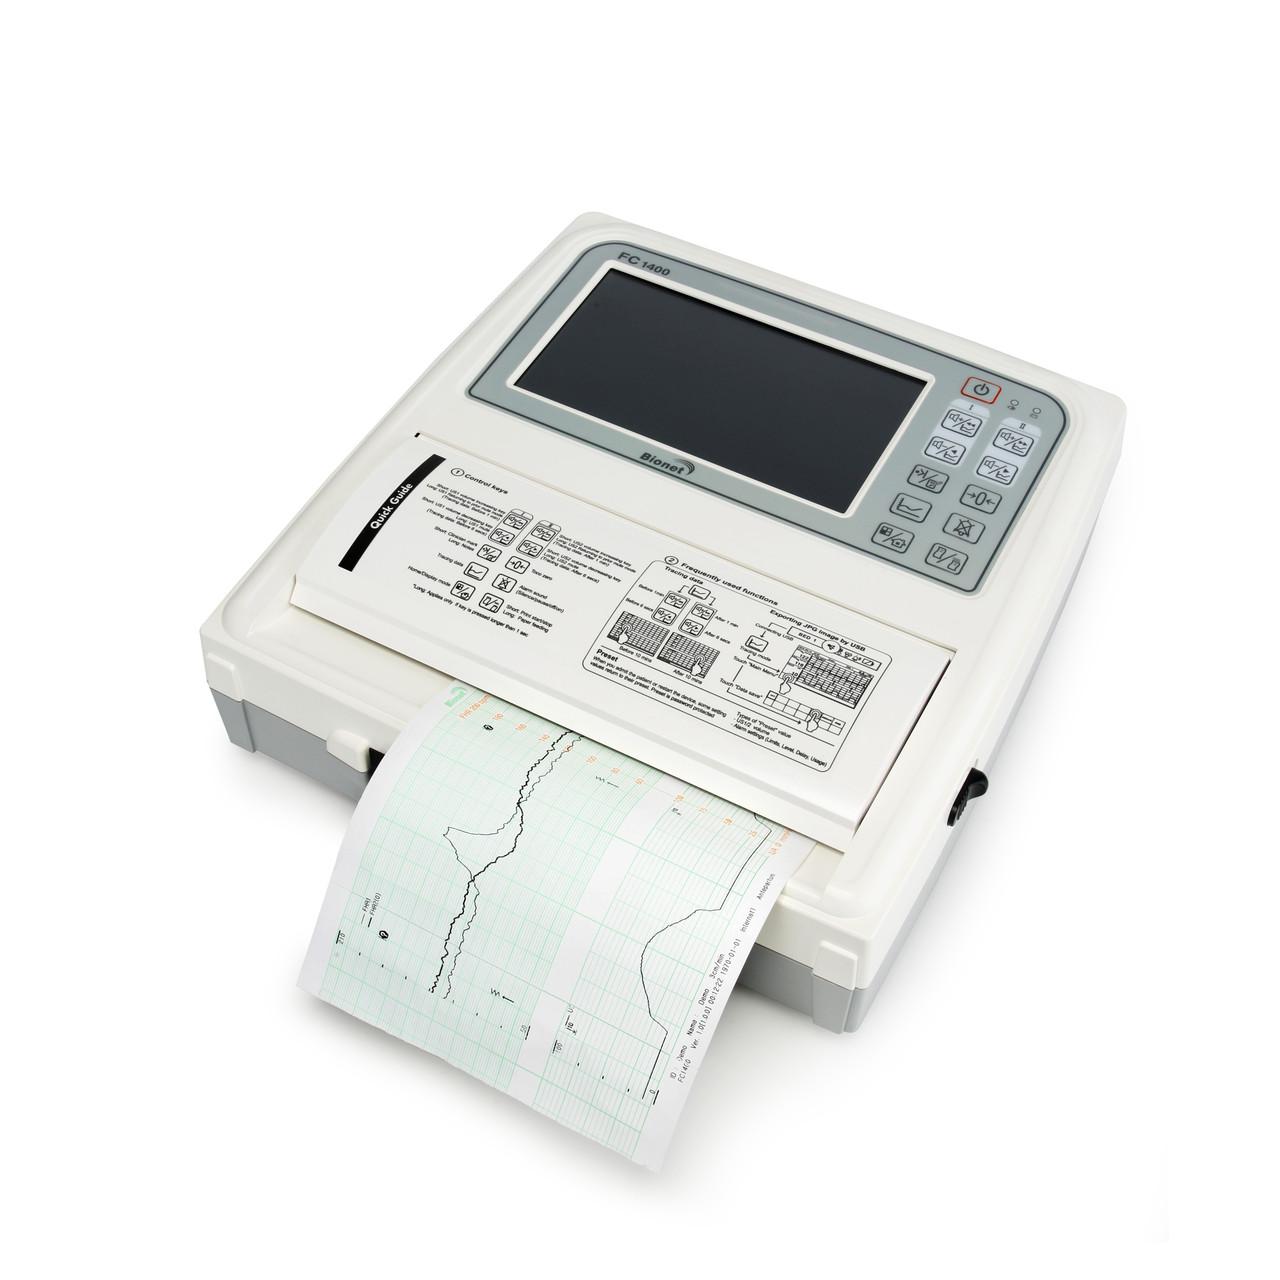 Bionet TwinView FC 1400